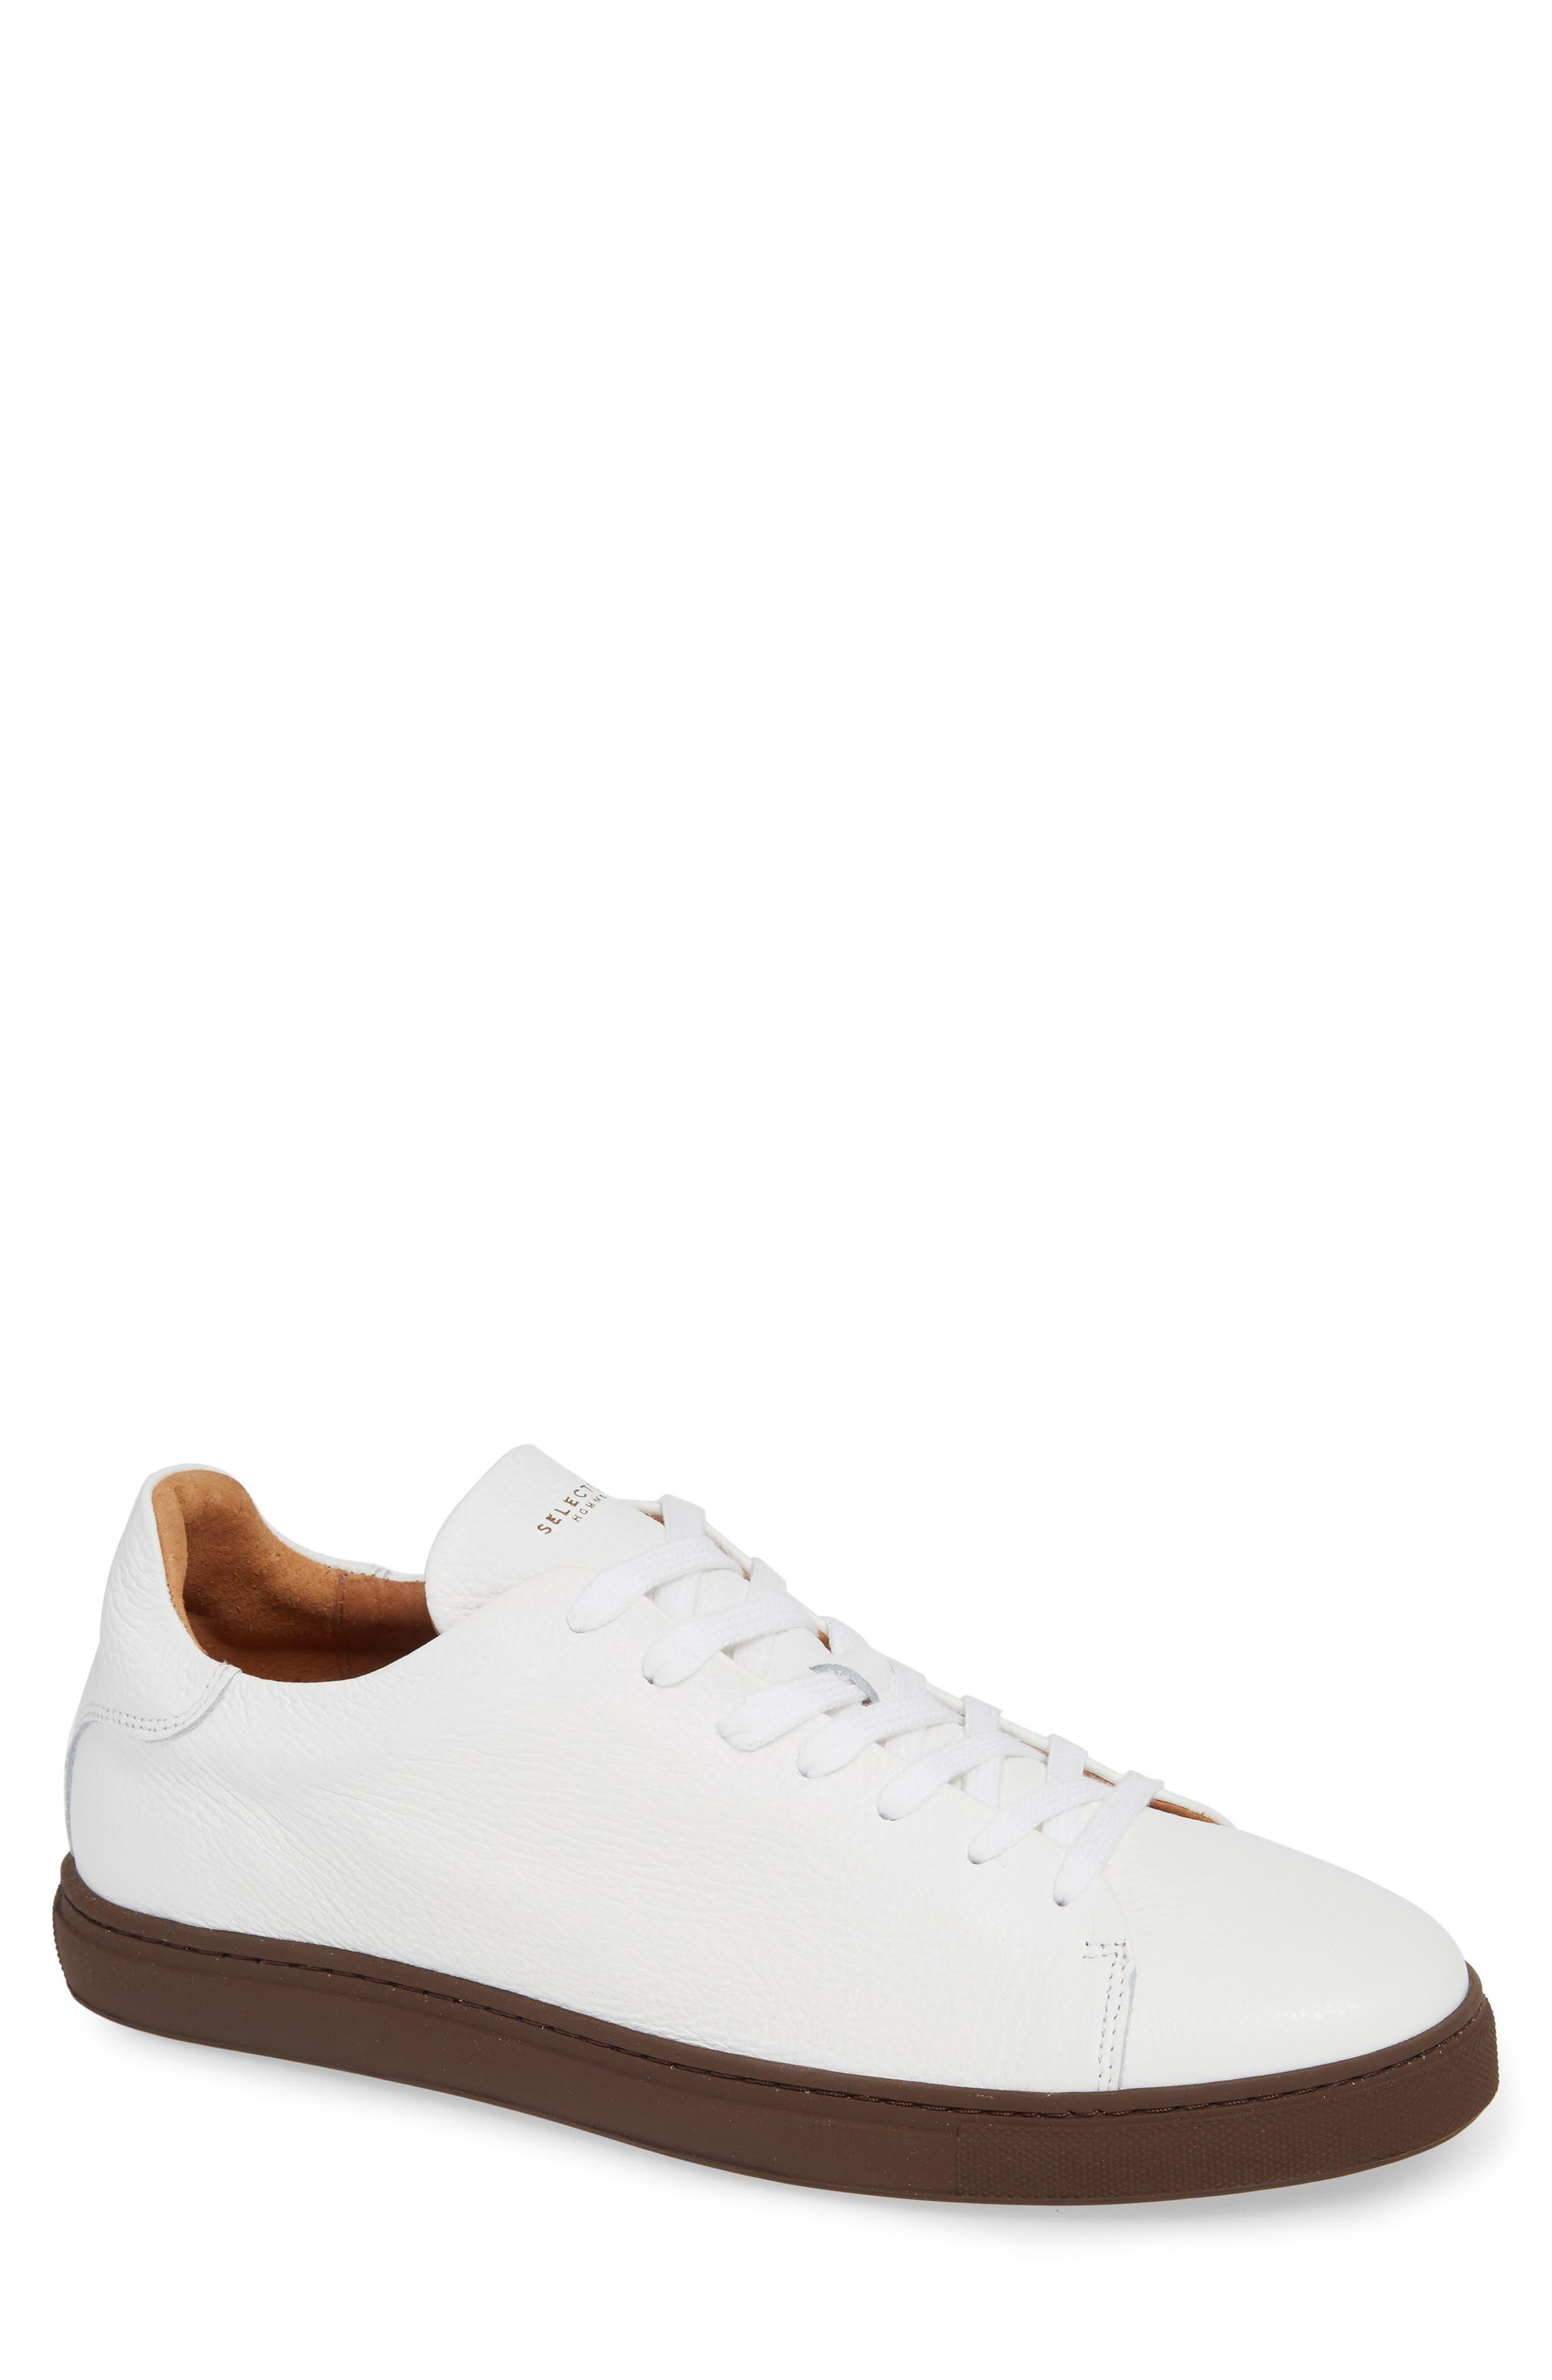 David Sneaker,                         Main,                         color, WHITE/ BURGUNDY SOLE